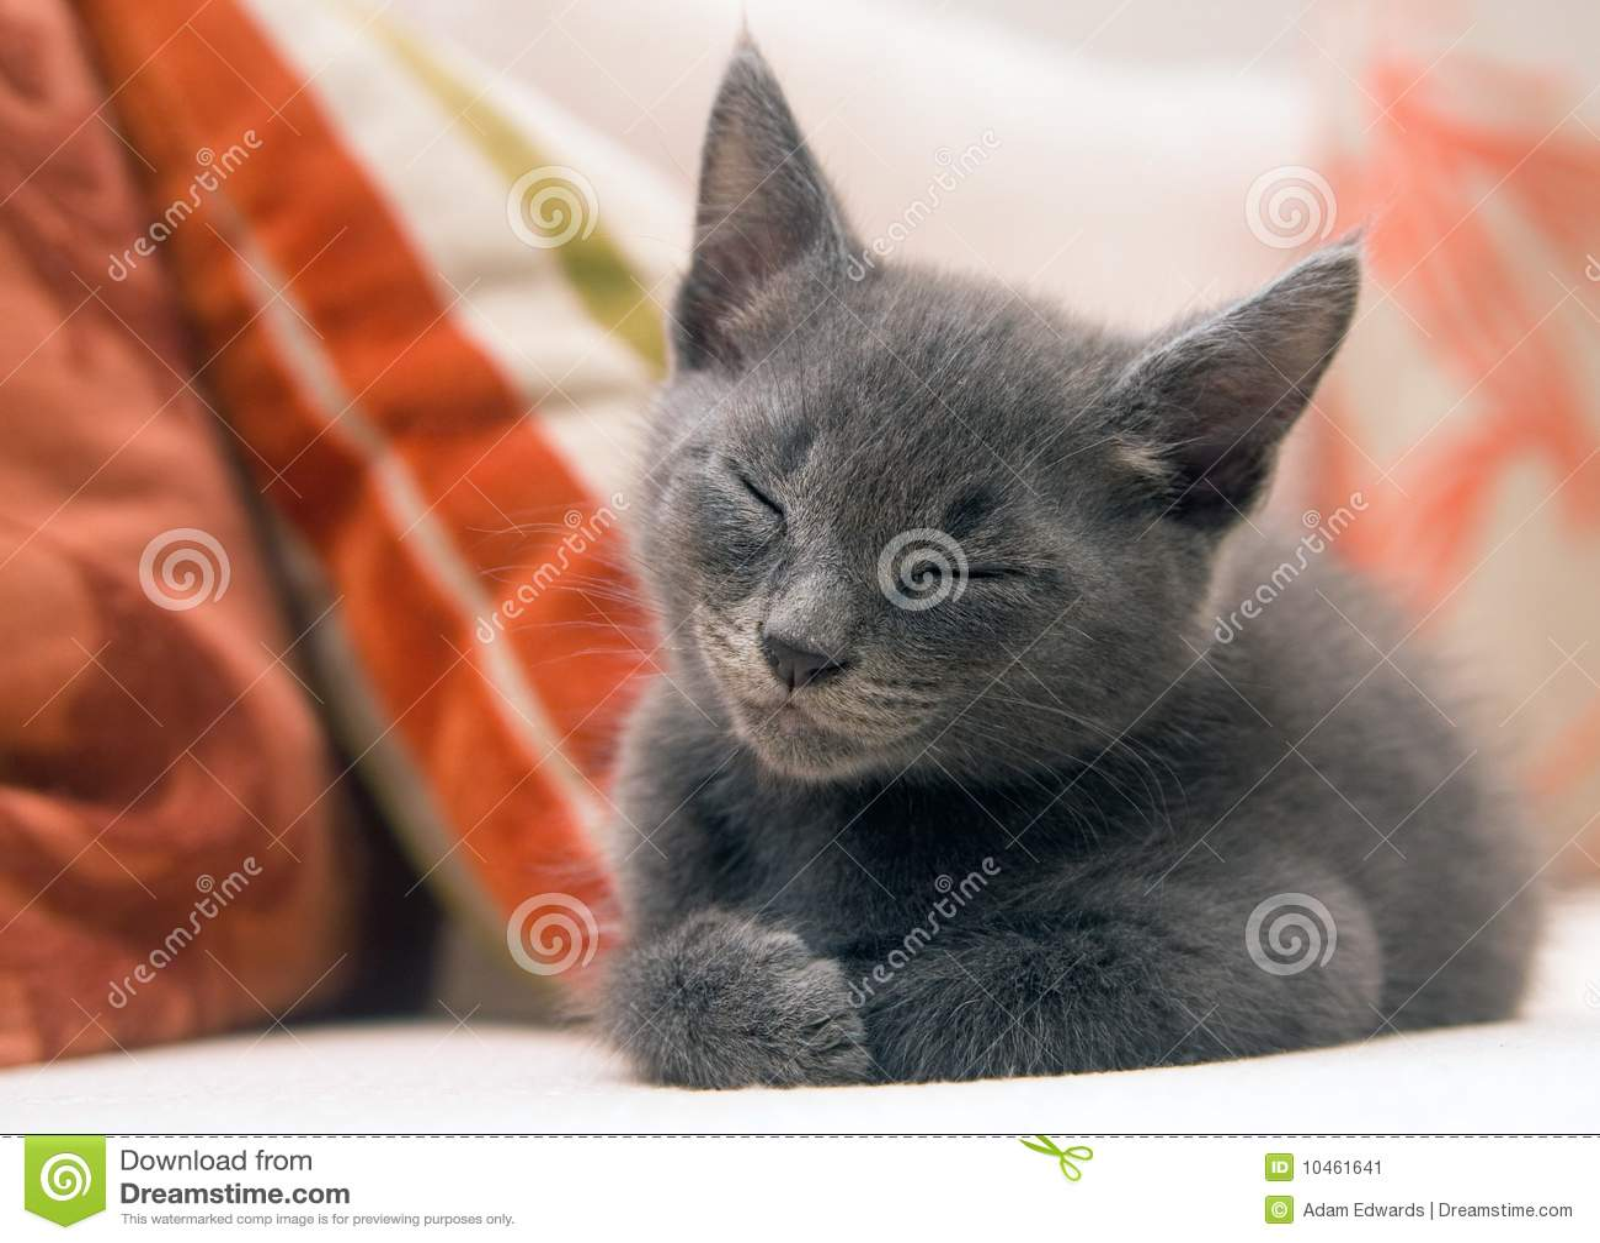 Cute Grey Kitten Asleep On A Sofa Stock Image Image